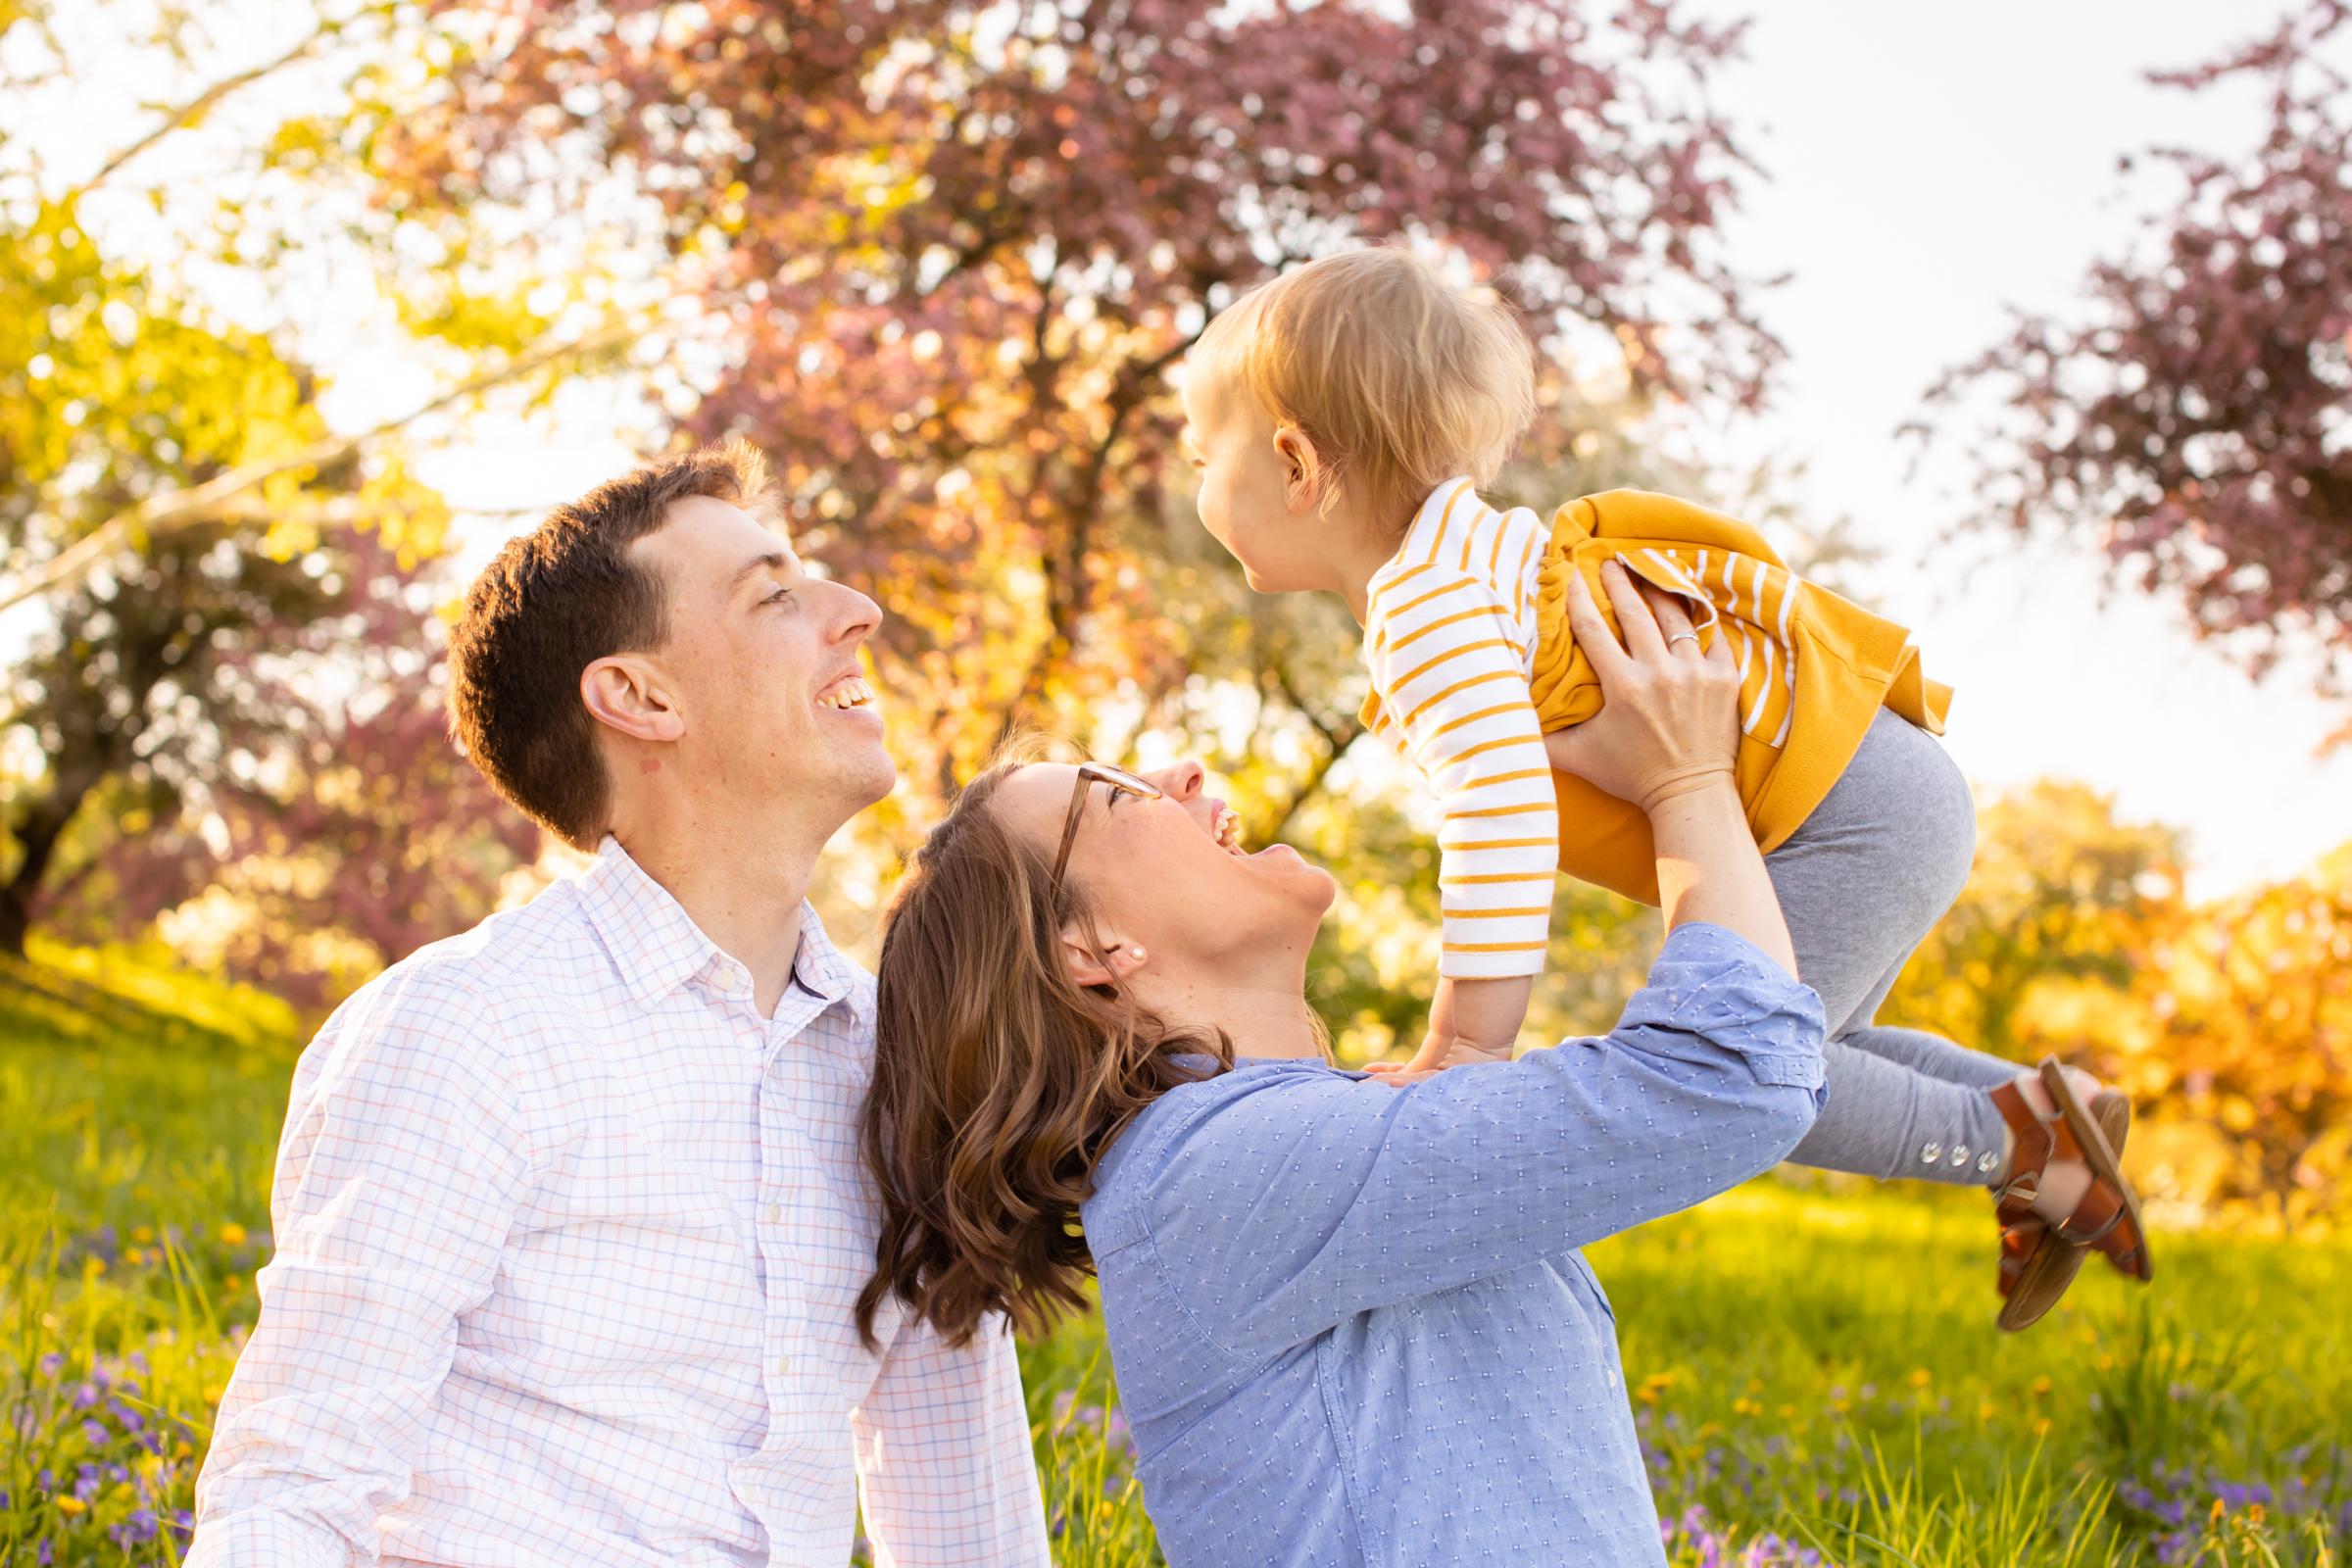 2019.05.11 Ramsey-Tooher Family-1430.jpeg